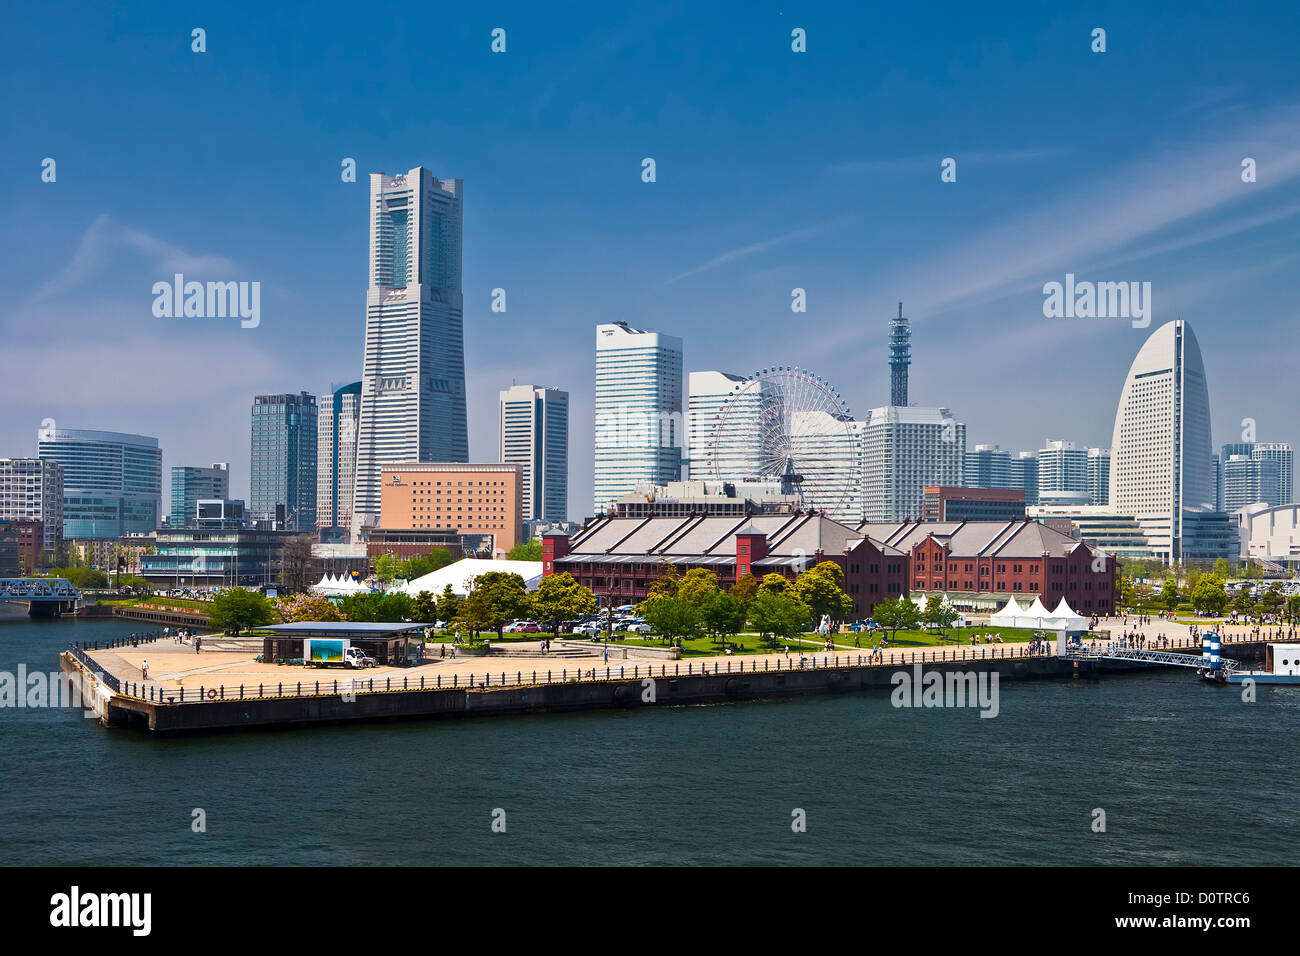 Japan, Asia, holiday, travel, Yokohama, City, Yokohama skyline, Landmark, Building, harbour, port - Stock Image